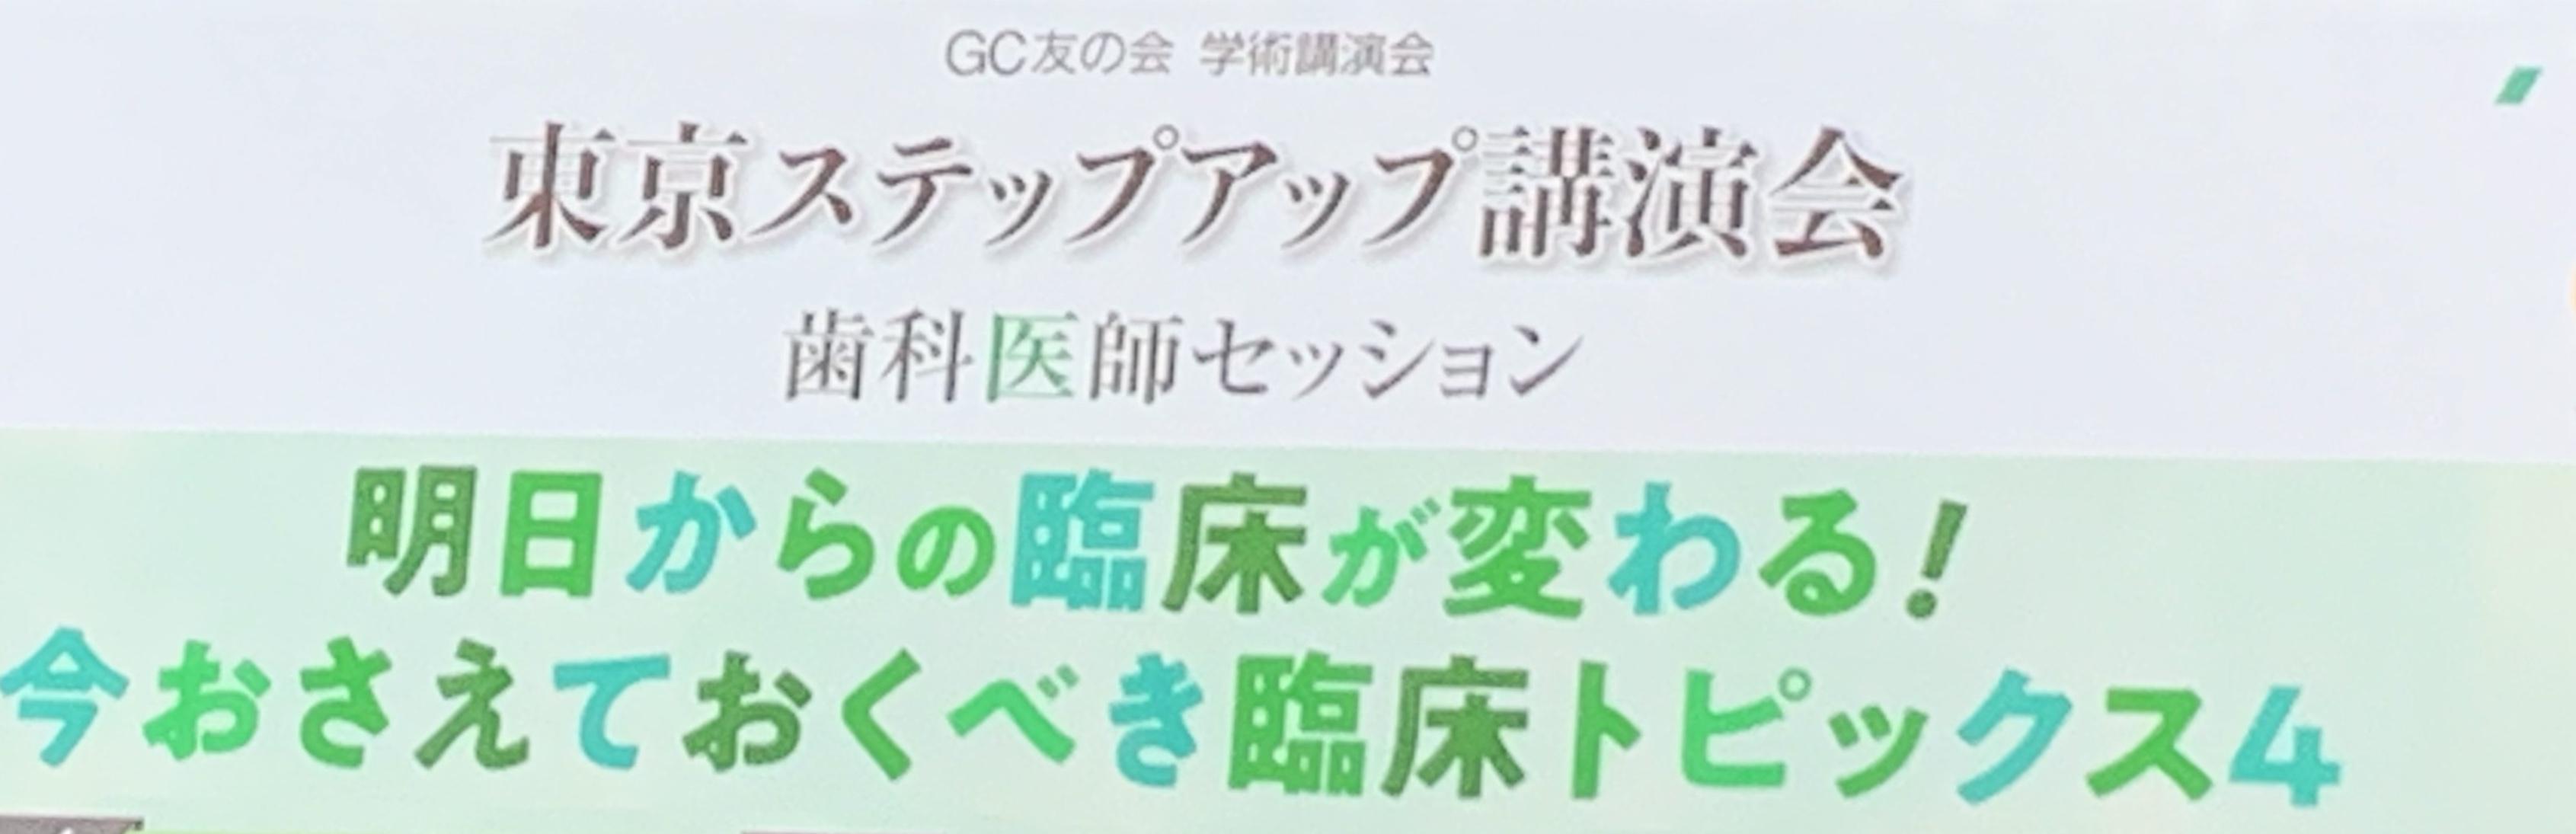 https://www.kumoi-dental.jp/diaryblog/82B4DA7C-6A6B-40BF-8688-AE2784BC6779.jpeg